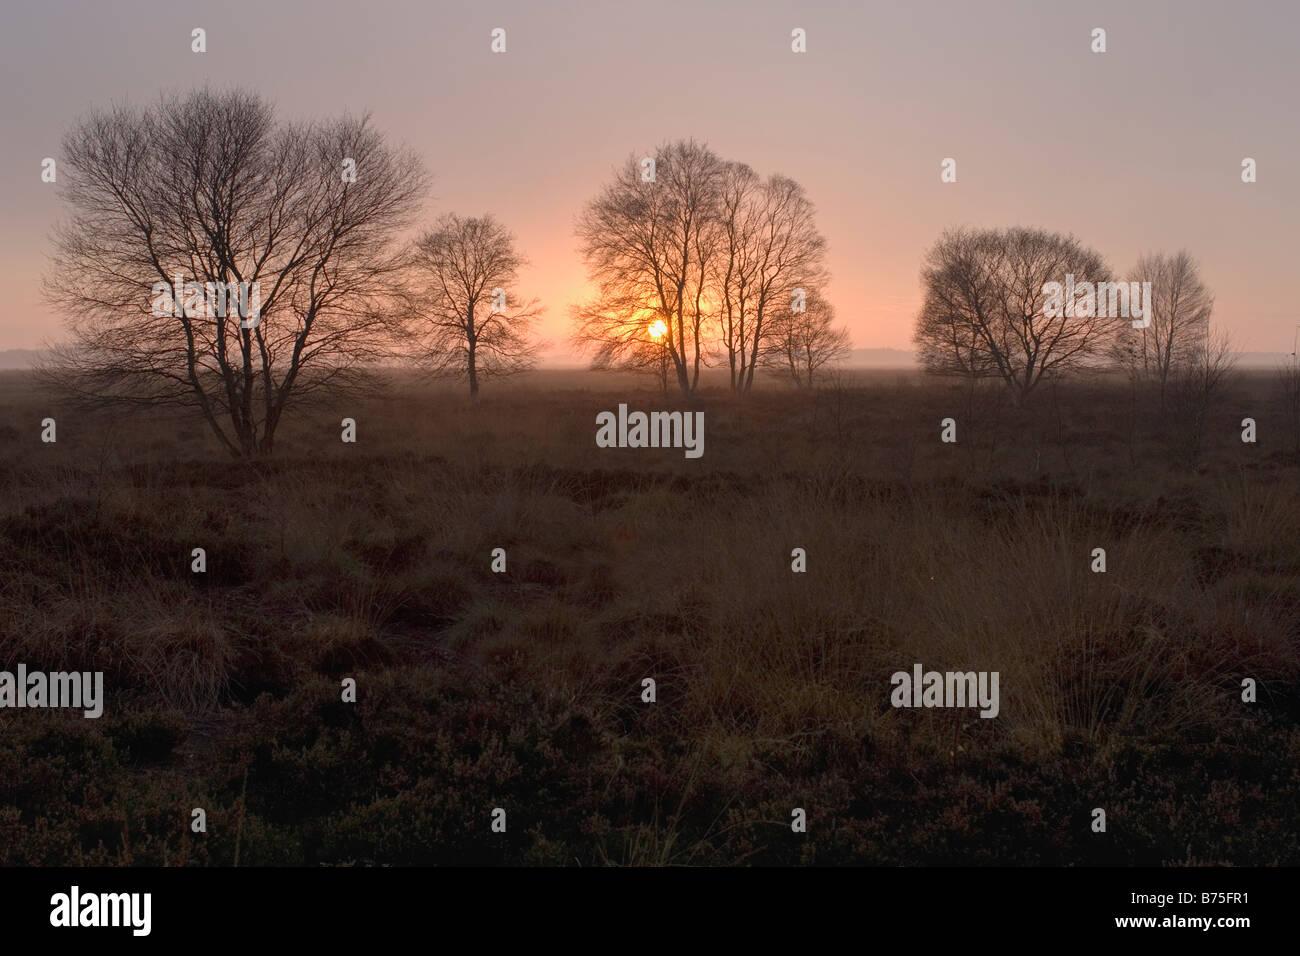 birchs in the sunset Stock Photo